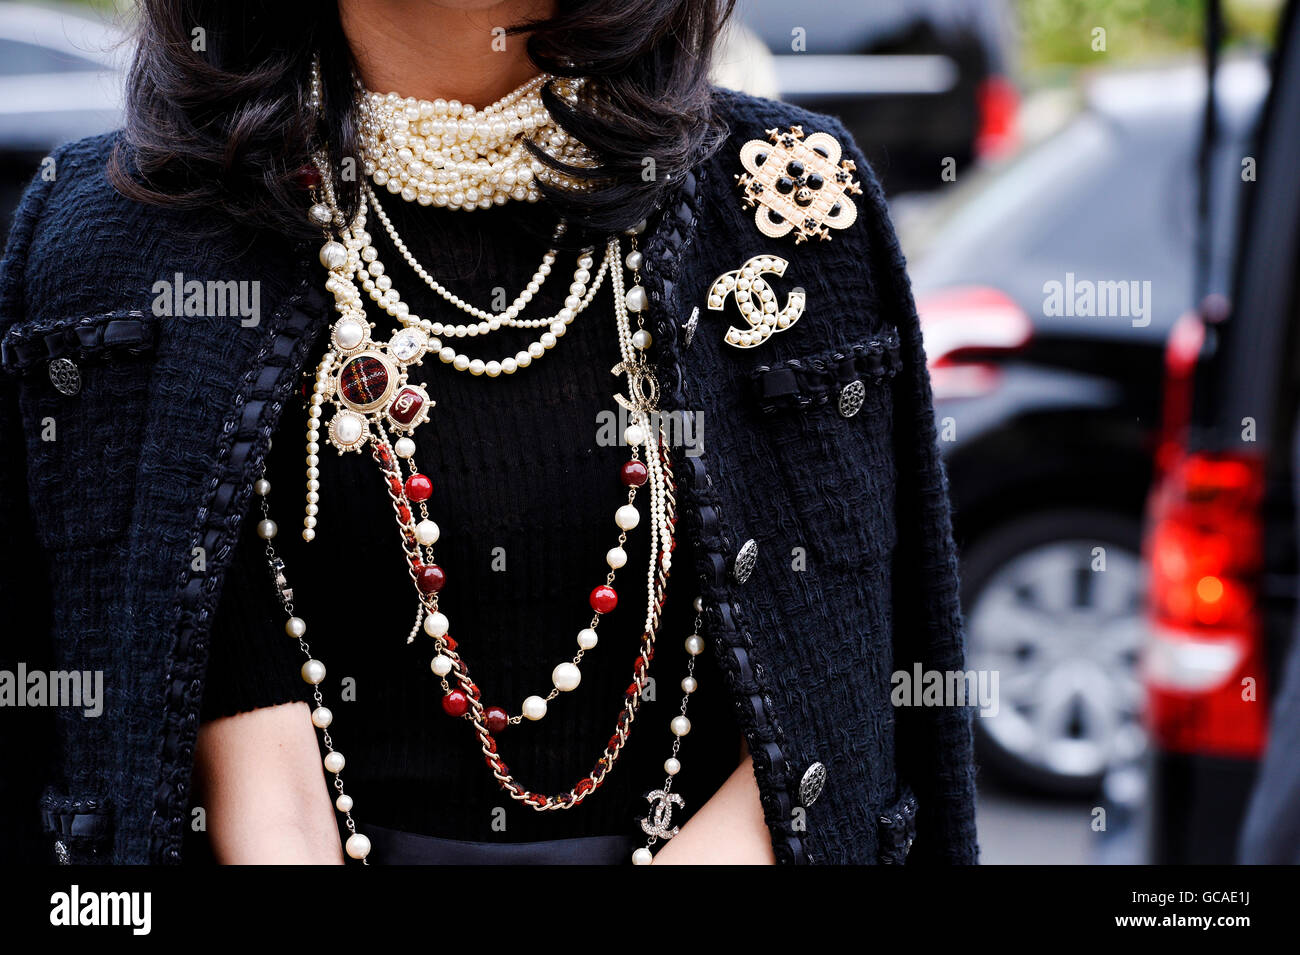 https://i0.wp.com/c8.alamy.com/comp/GCAE1J/streetstyle-outside-chanel-show-paris-fashion-week-haute-couture-aw-GCAE1J.jpg